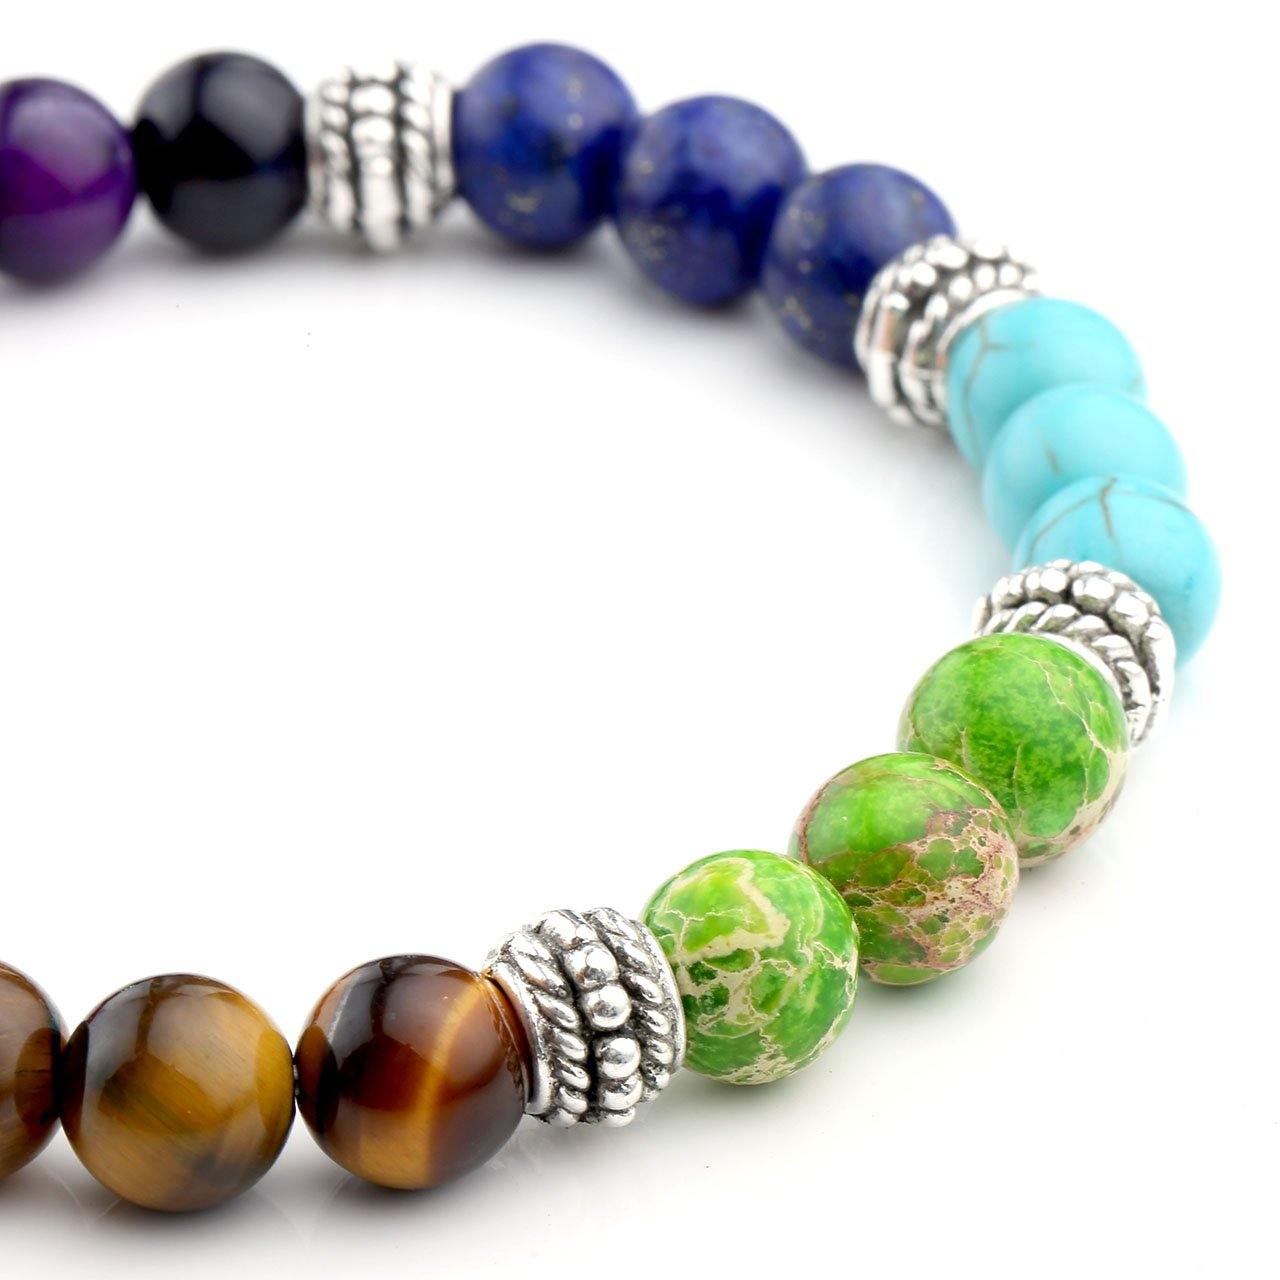 JSDDE Schmuck, Unisex Energietherapie Yoga-Armband 7 Chakra Healing Balance Armreif Wurzelchakra Elastisches Armband